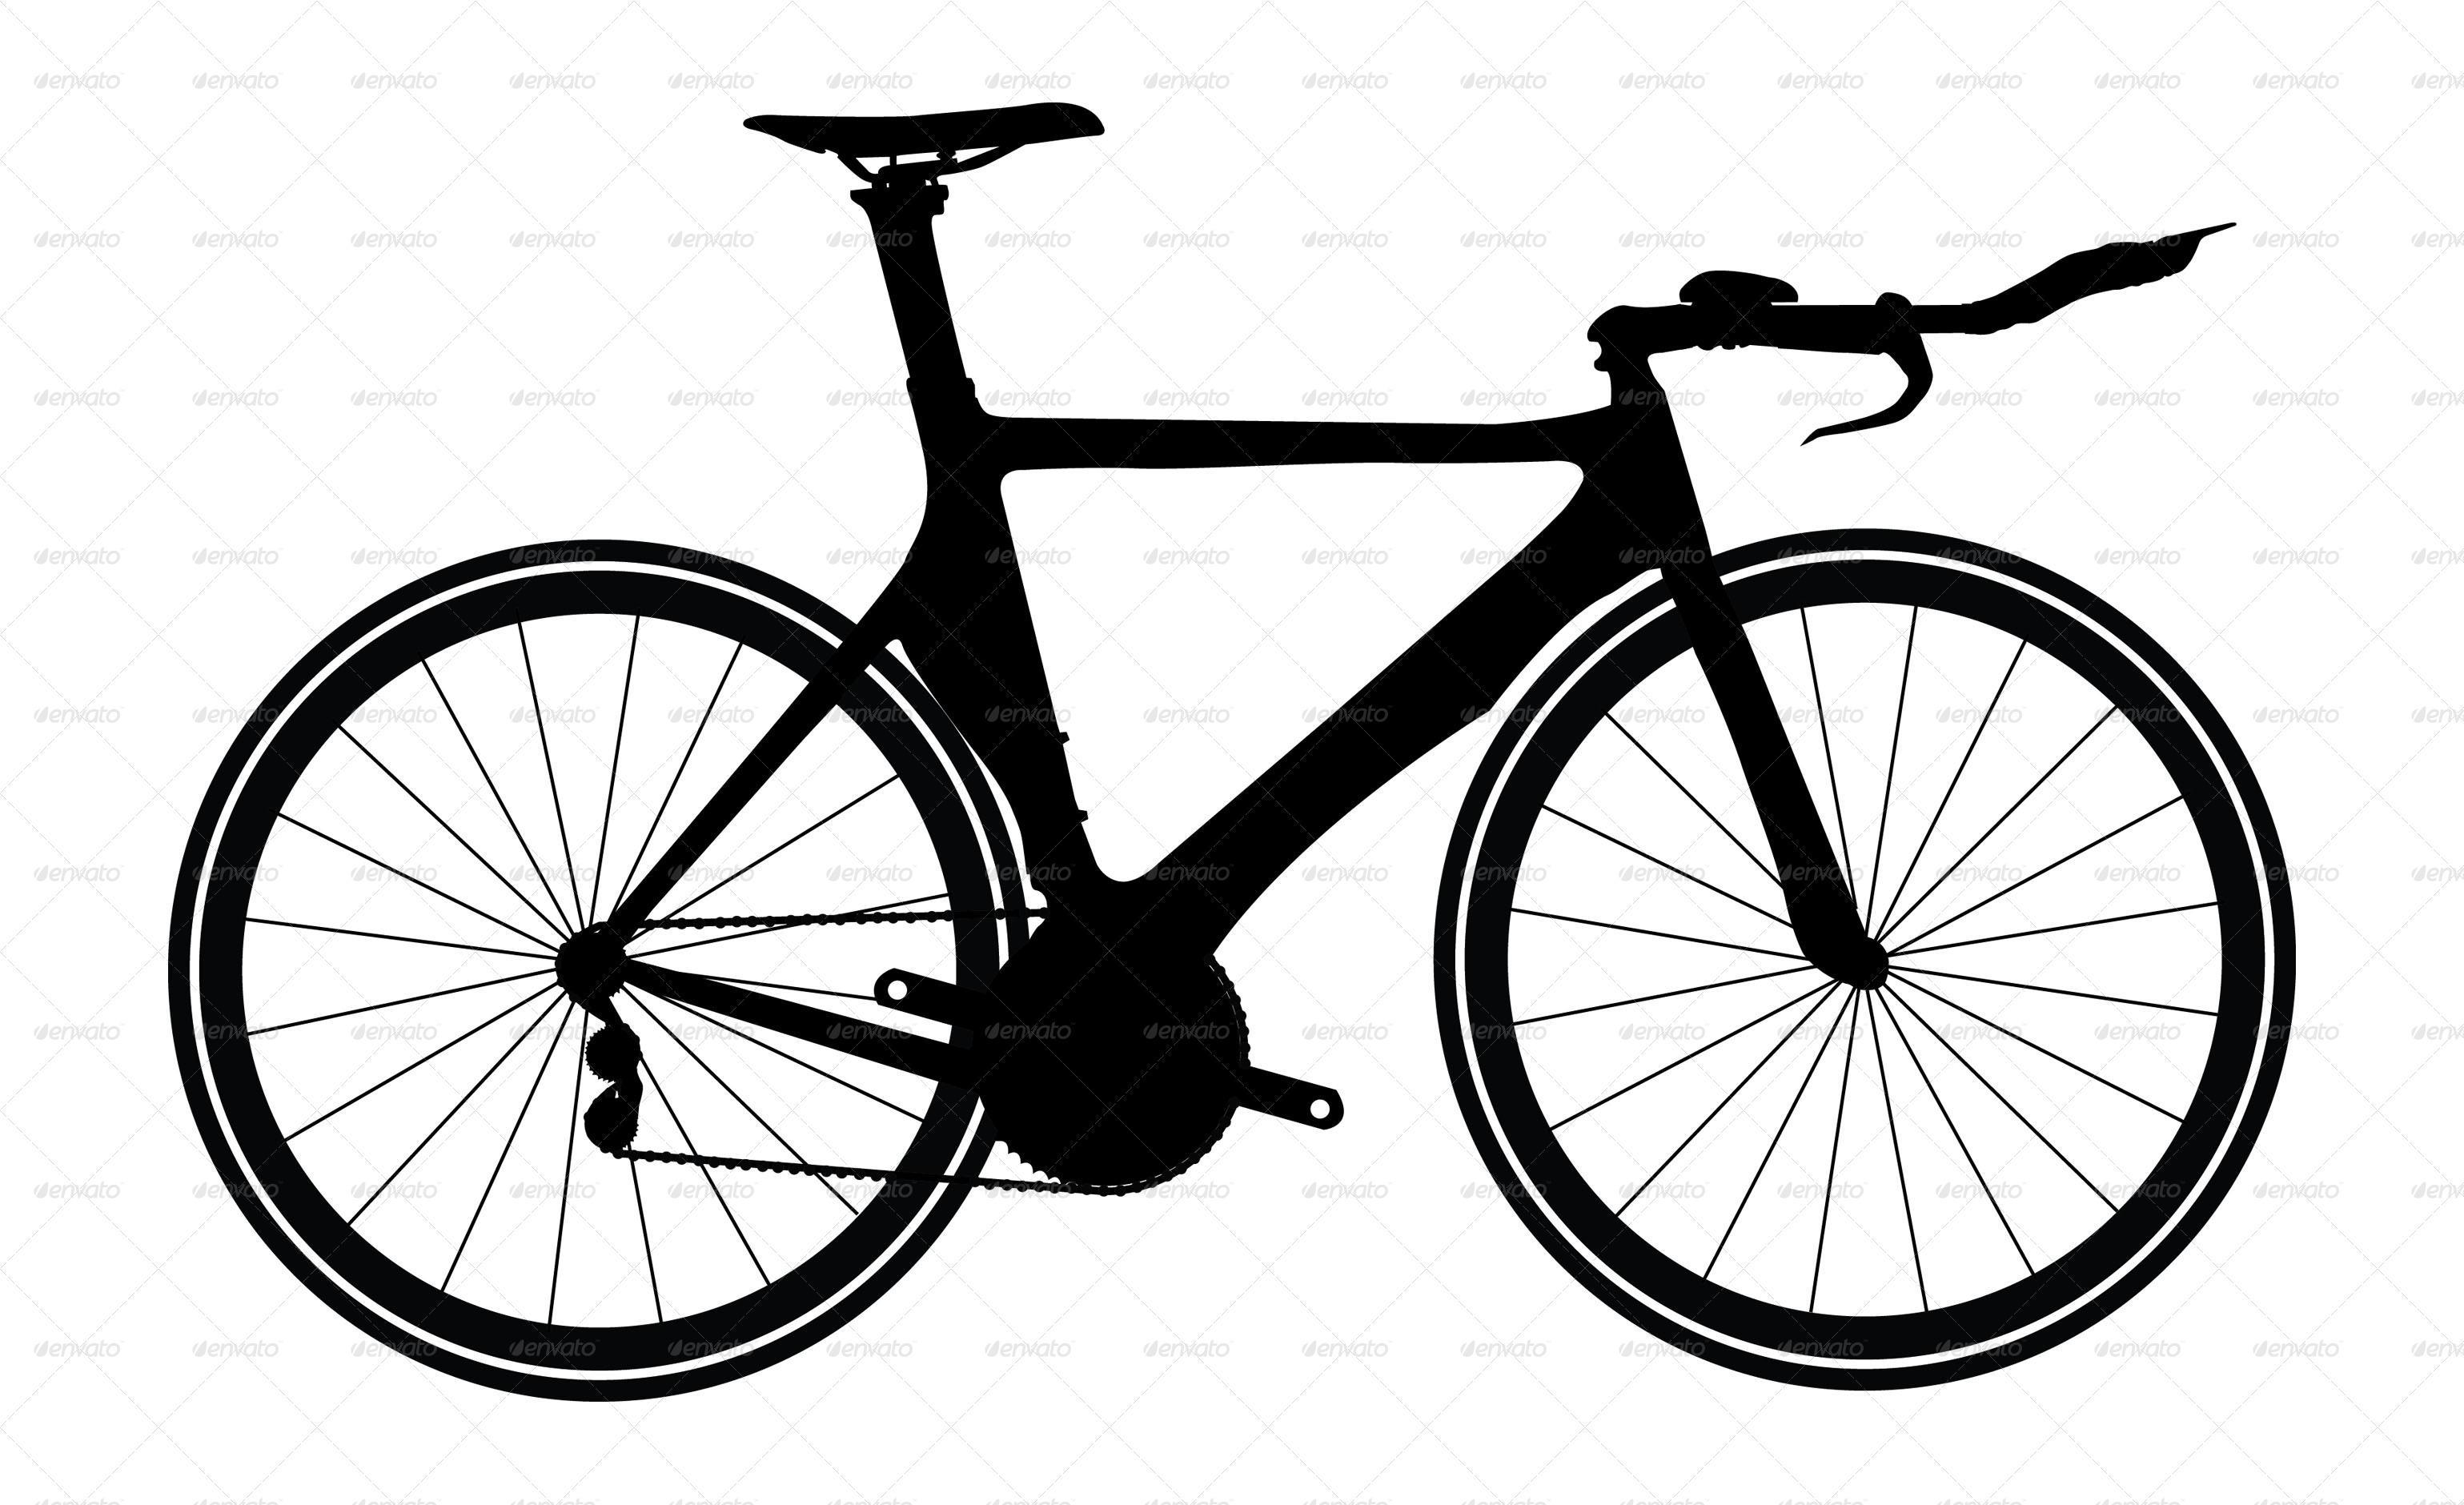 Bicycle Silhouettes By Mdshahidullah609